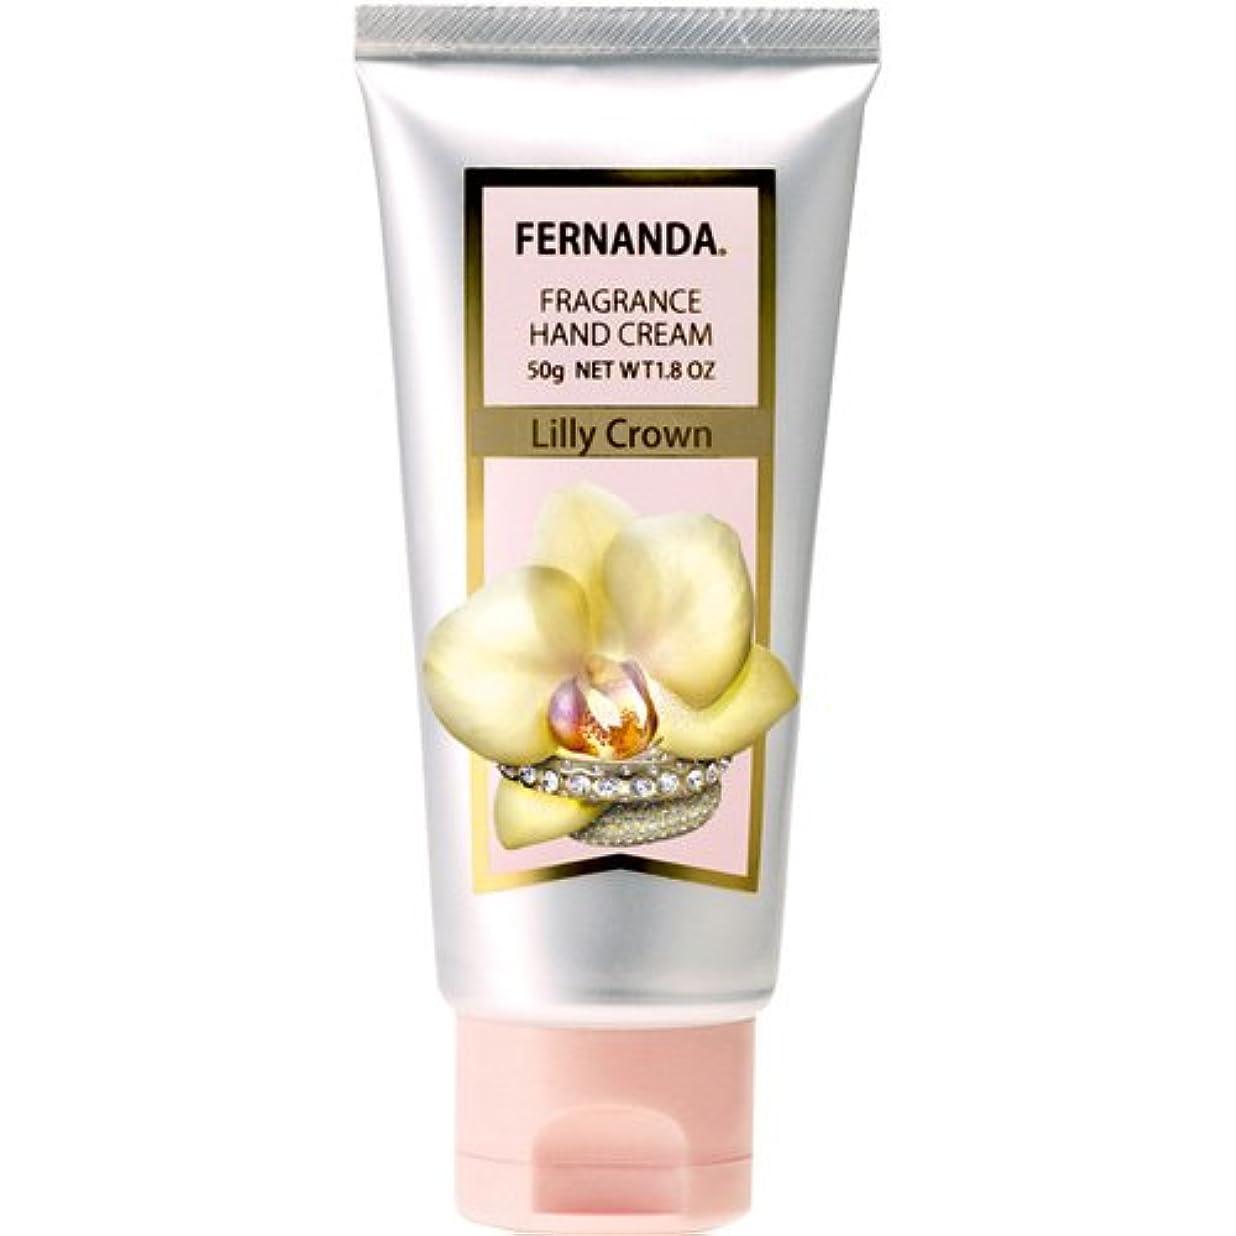 FERNANDA(フェルナンダ) Hand Cream Lilly Crown (ハンドクリーム リリークラウン)